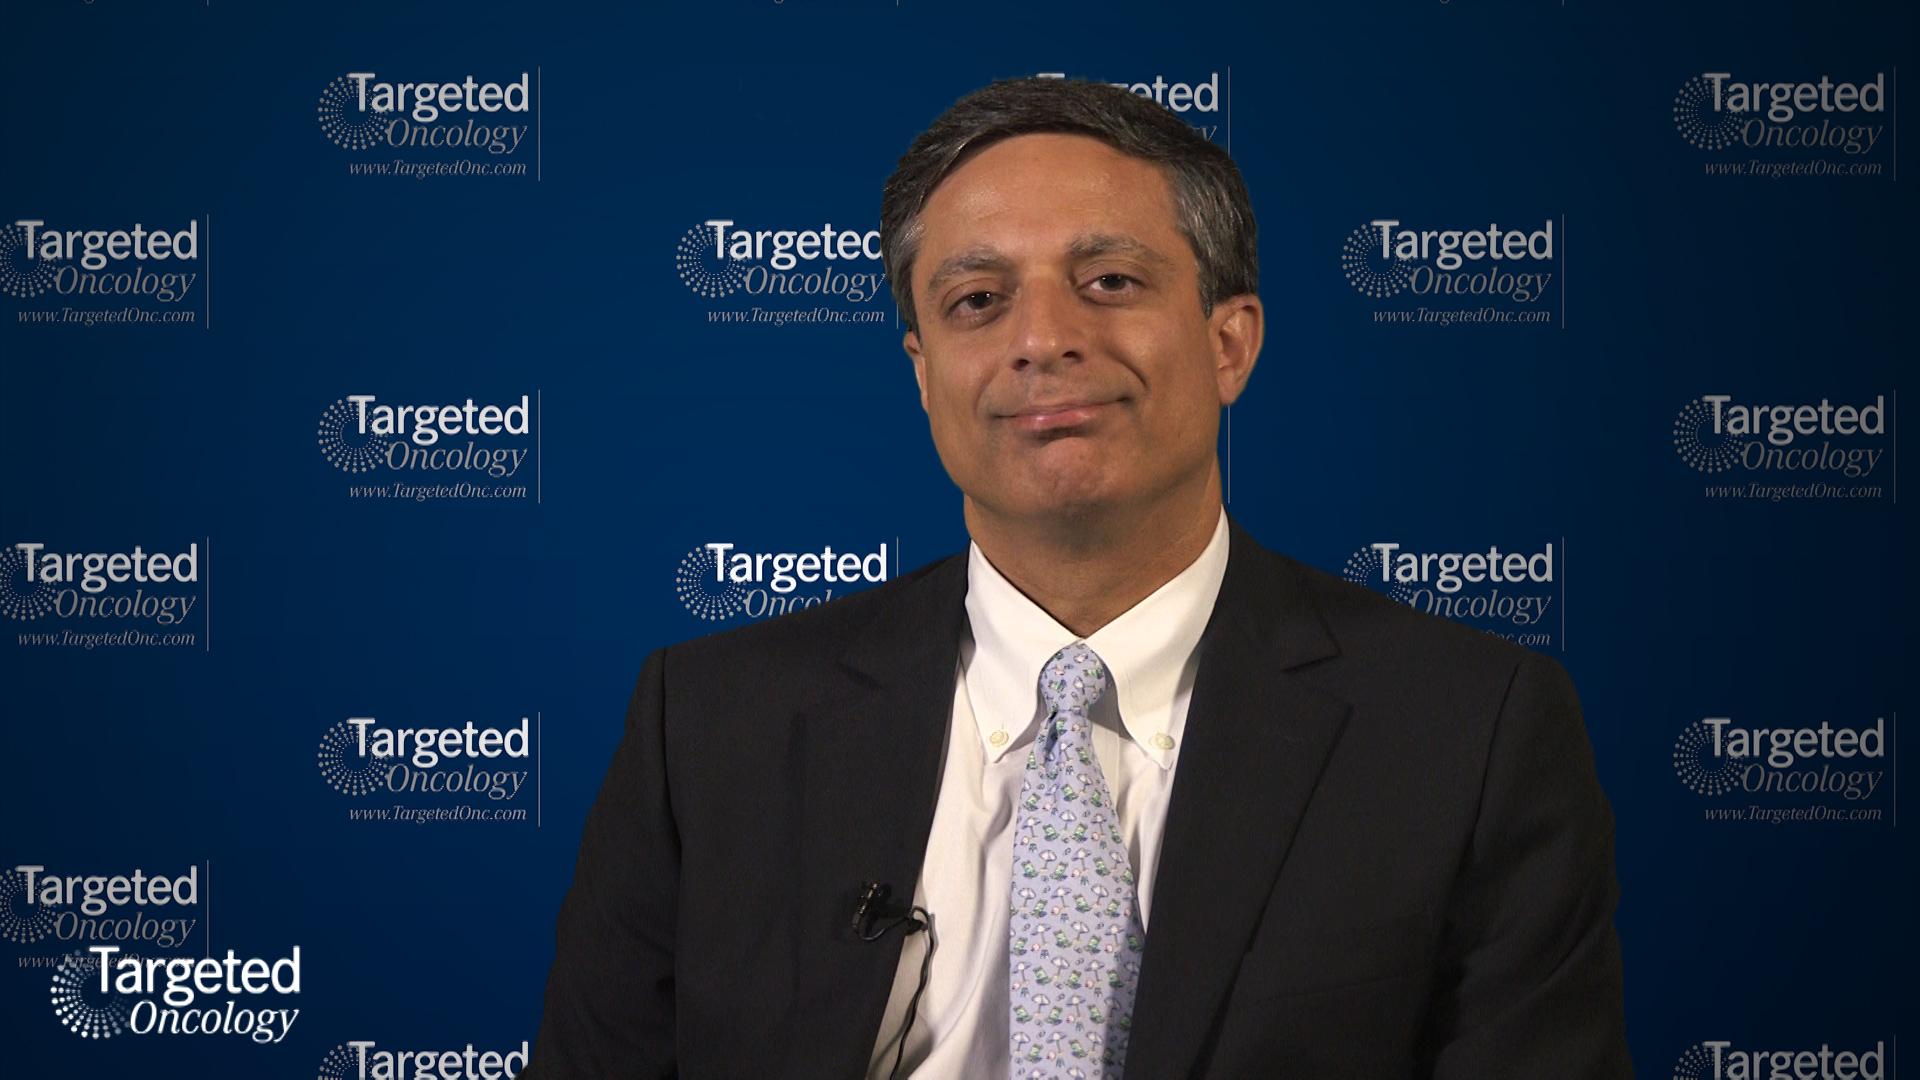 Management of High-Risk Multiple Myeloma